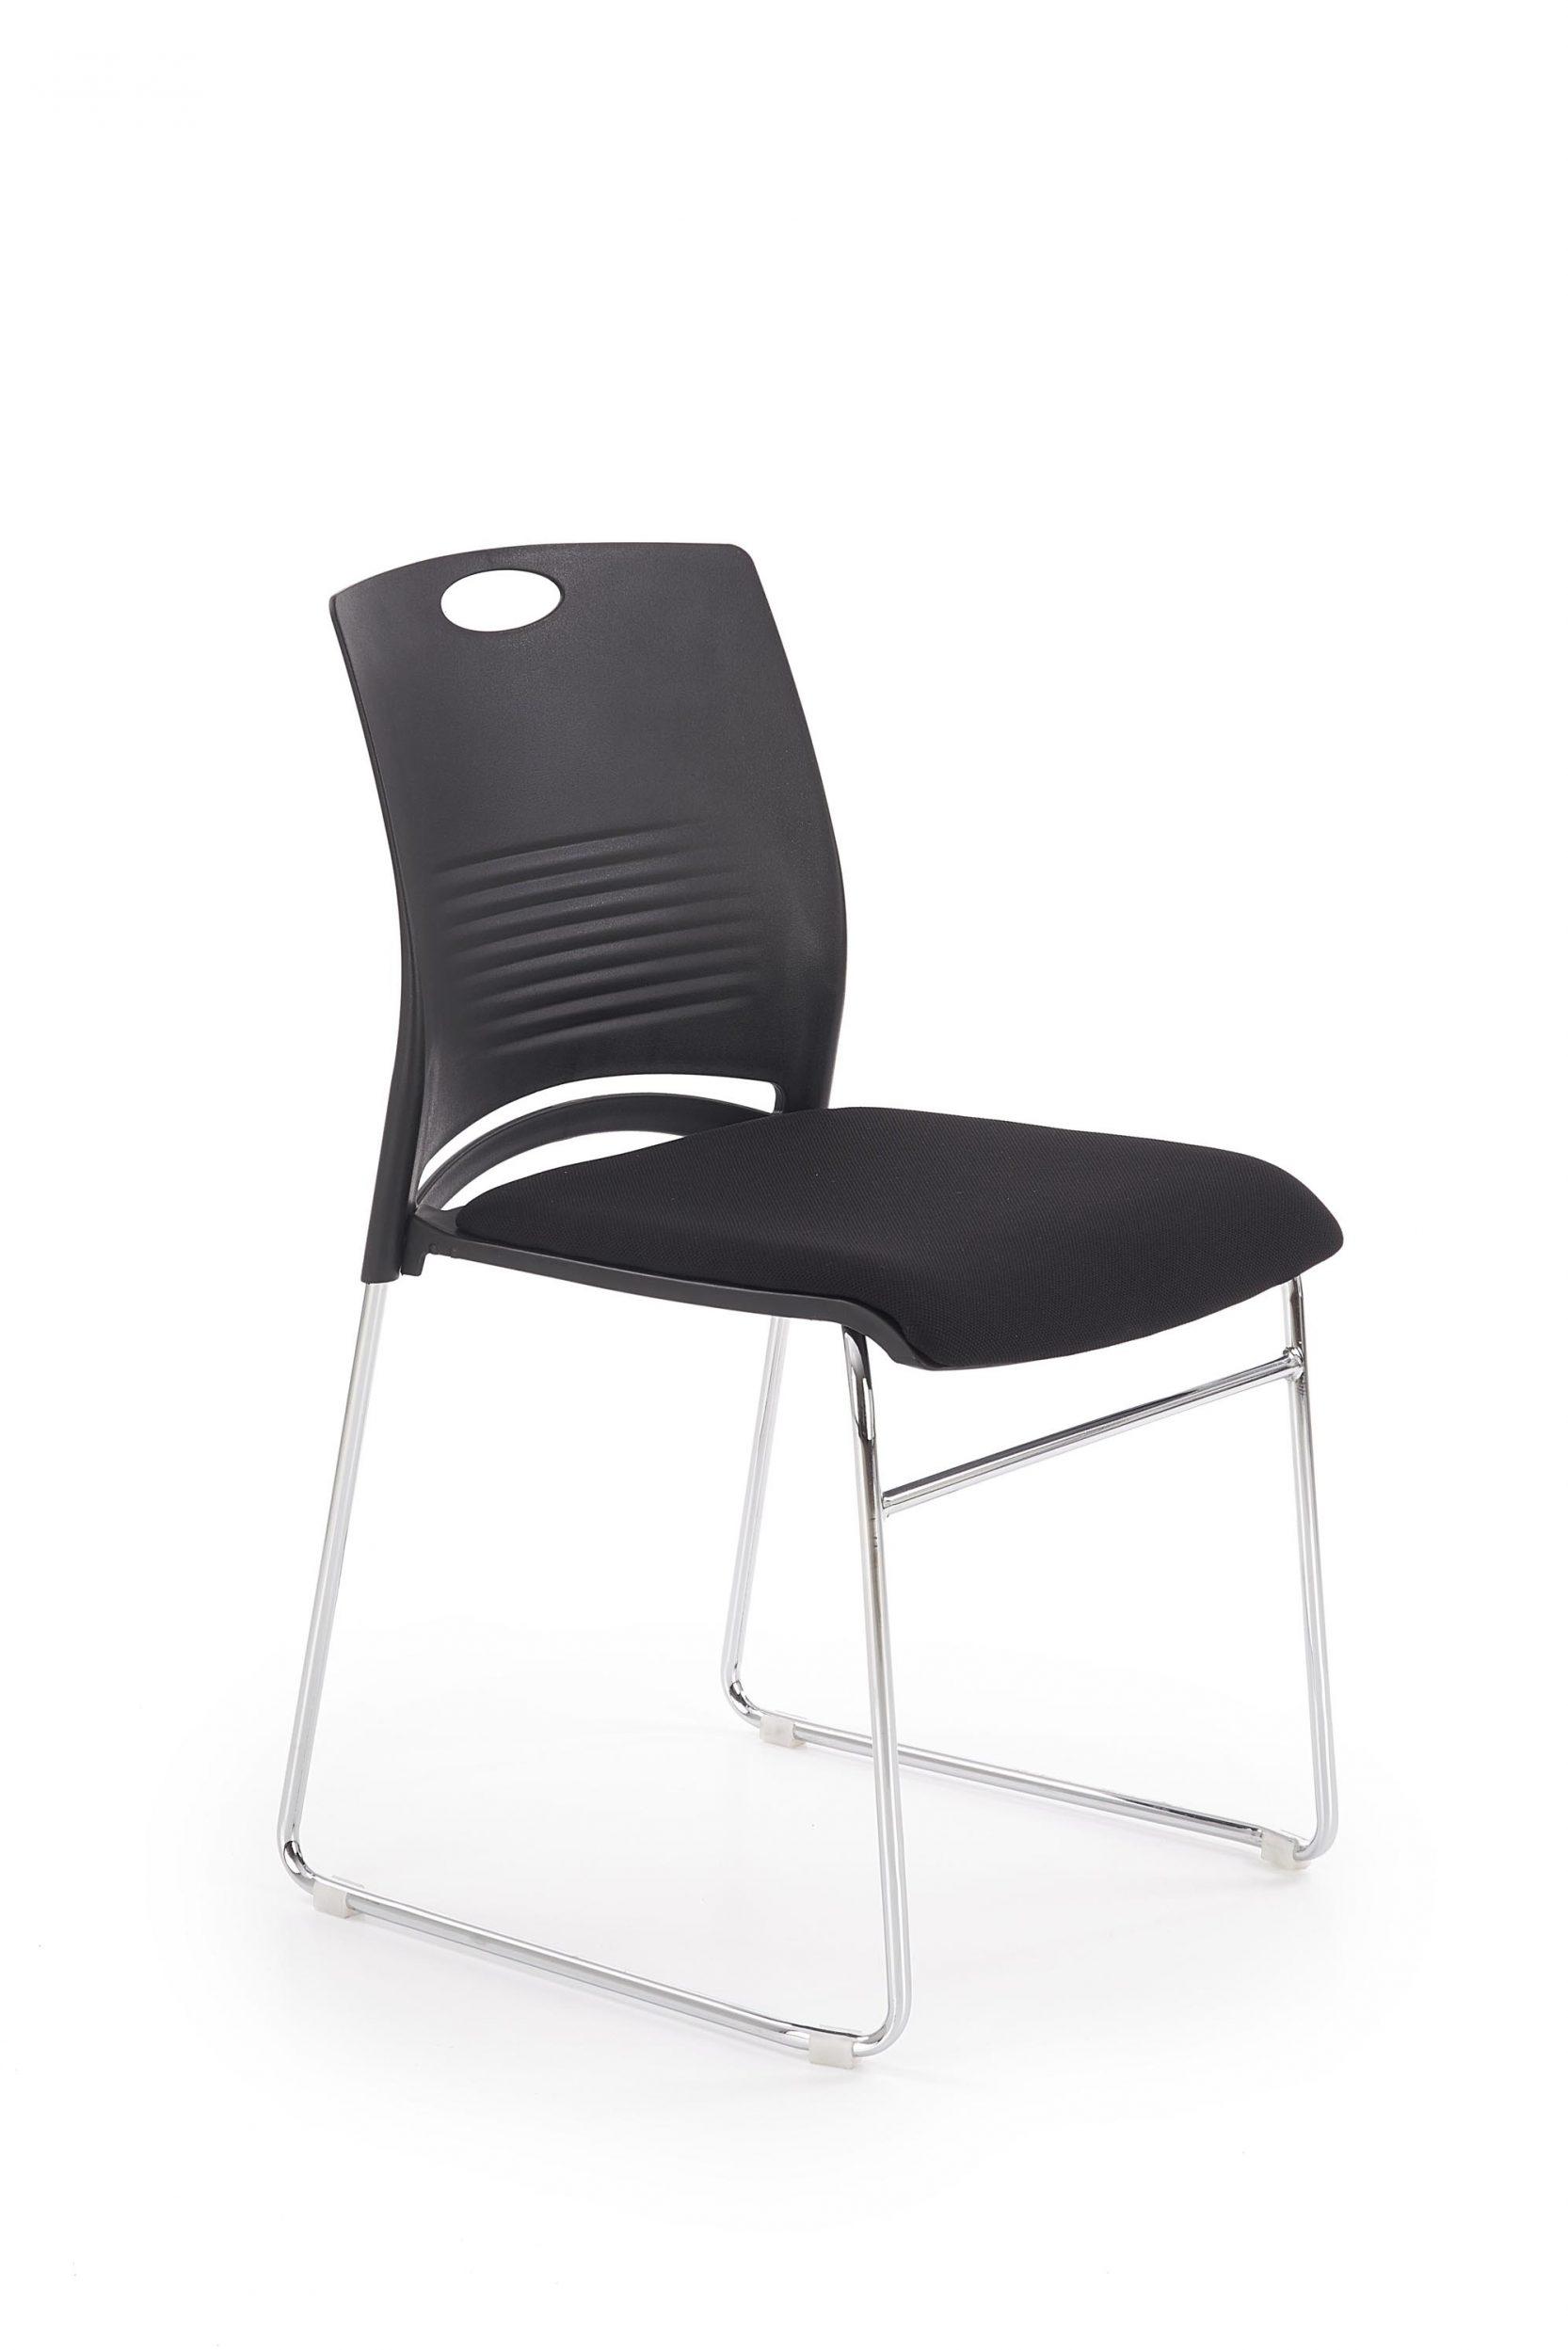 Scaun din plastic, cu sezut tapitat cu stofa si picioare metalice Calis Negru, l44xA52xH80 cm